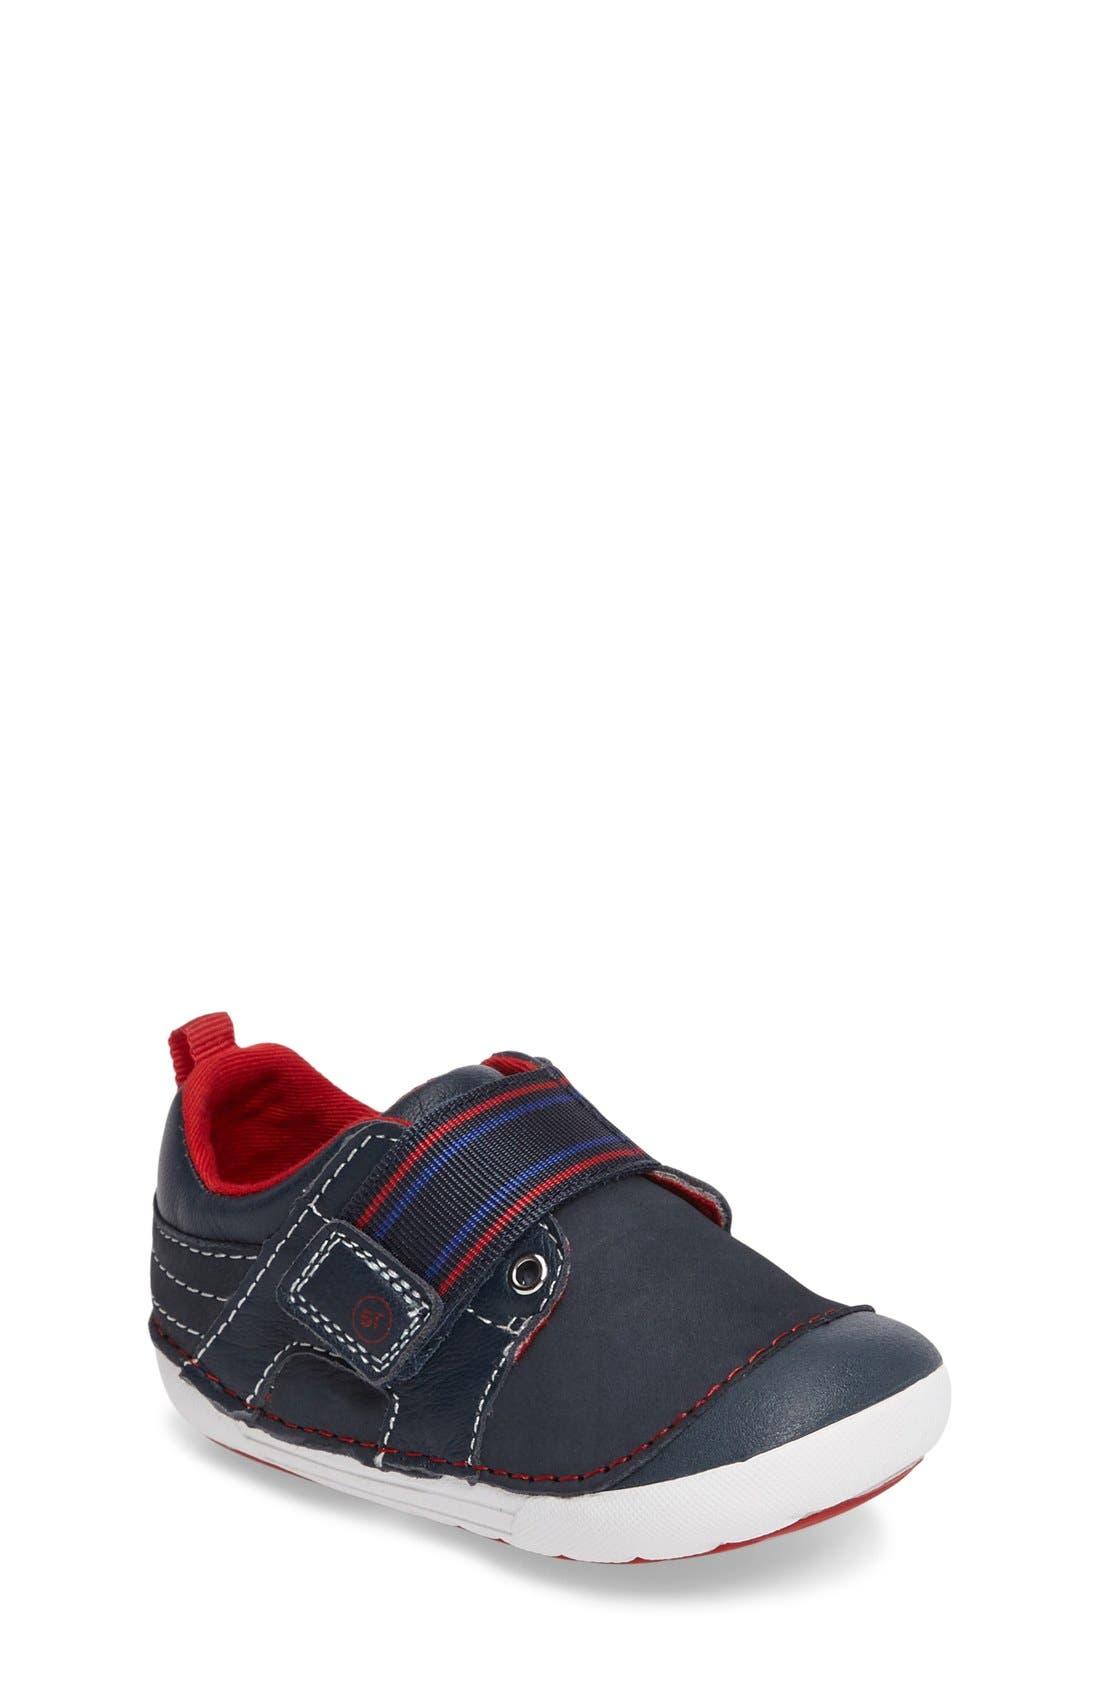 Main Image - Stride Rite Soft Motion™ Cameron Sneaker (Baby & Walker)